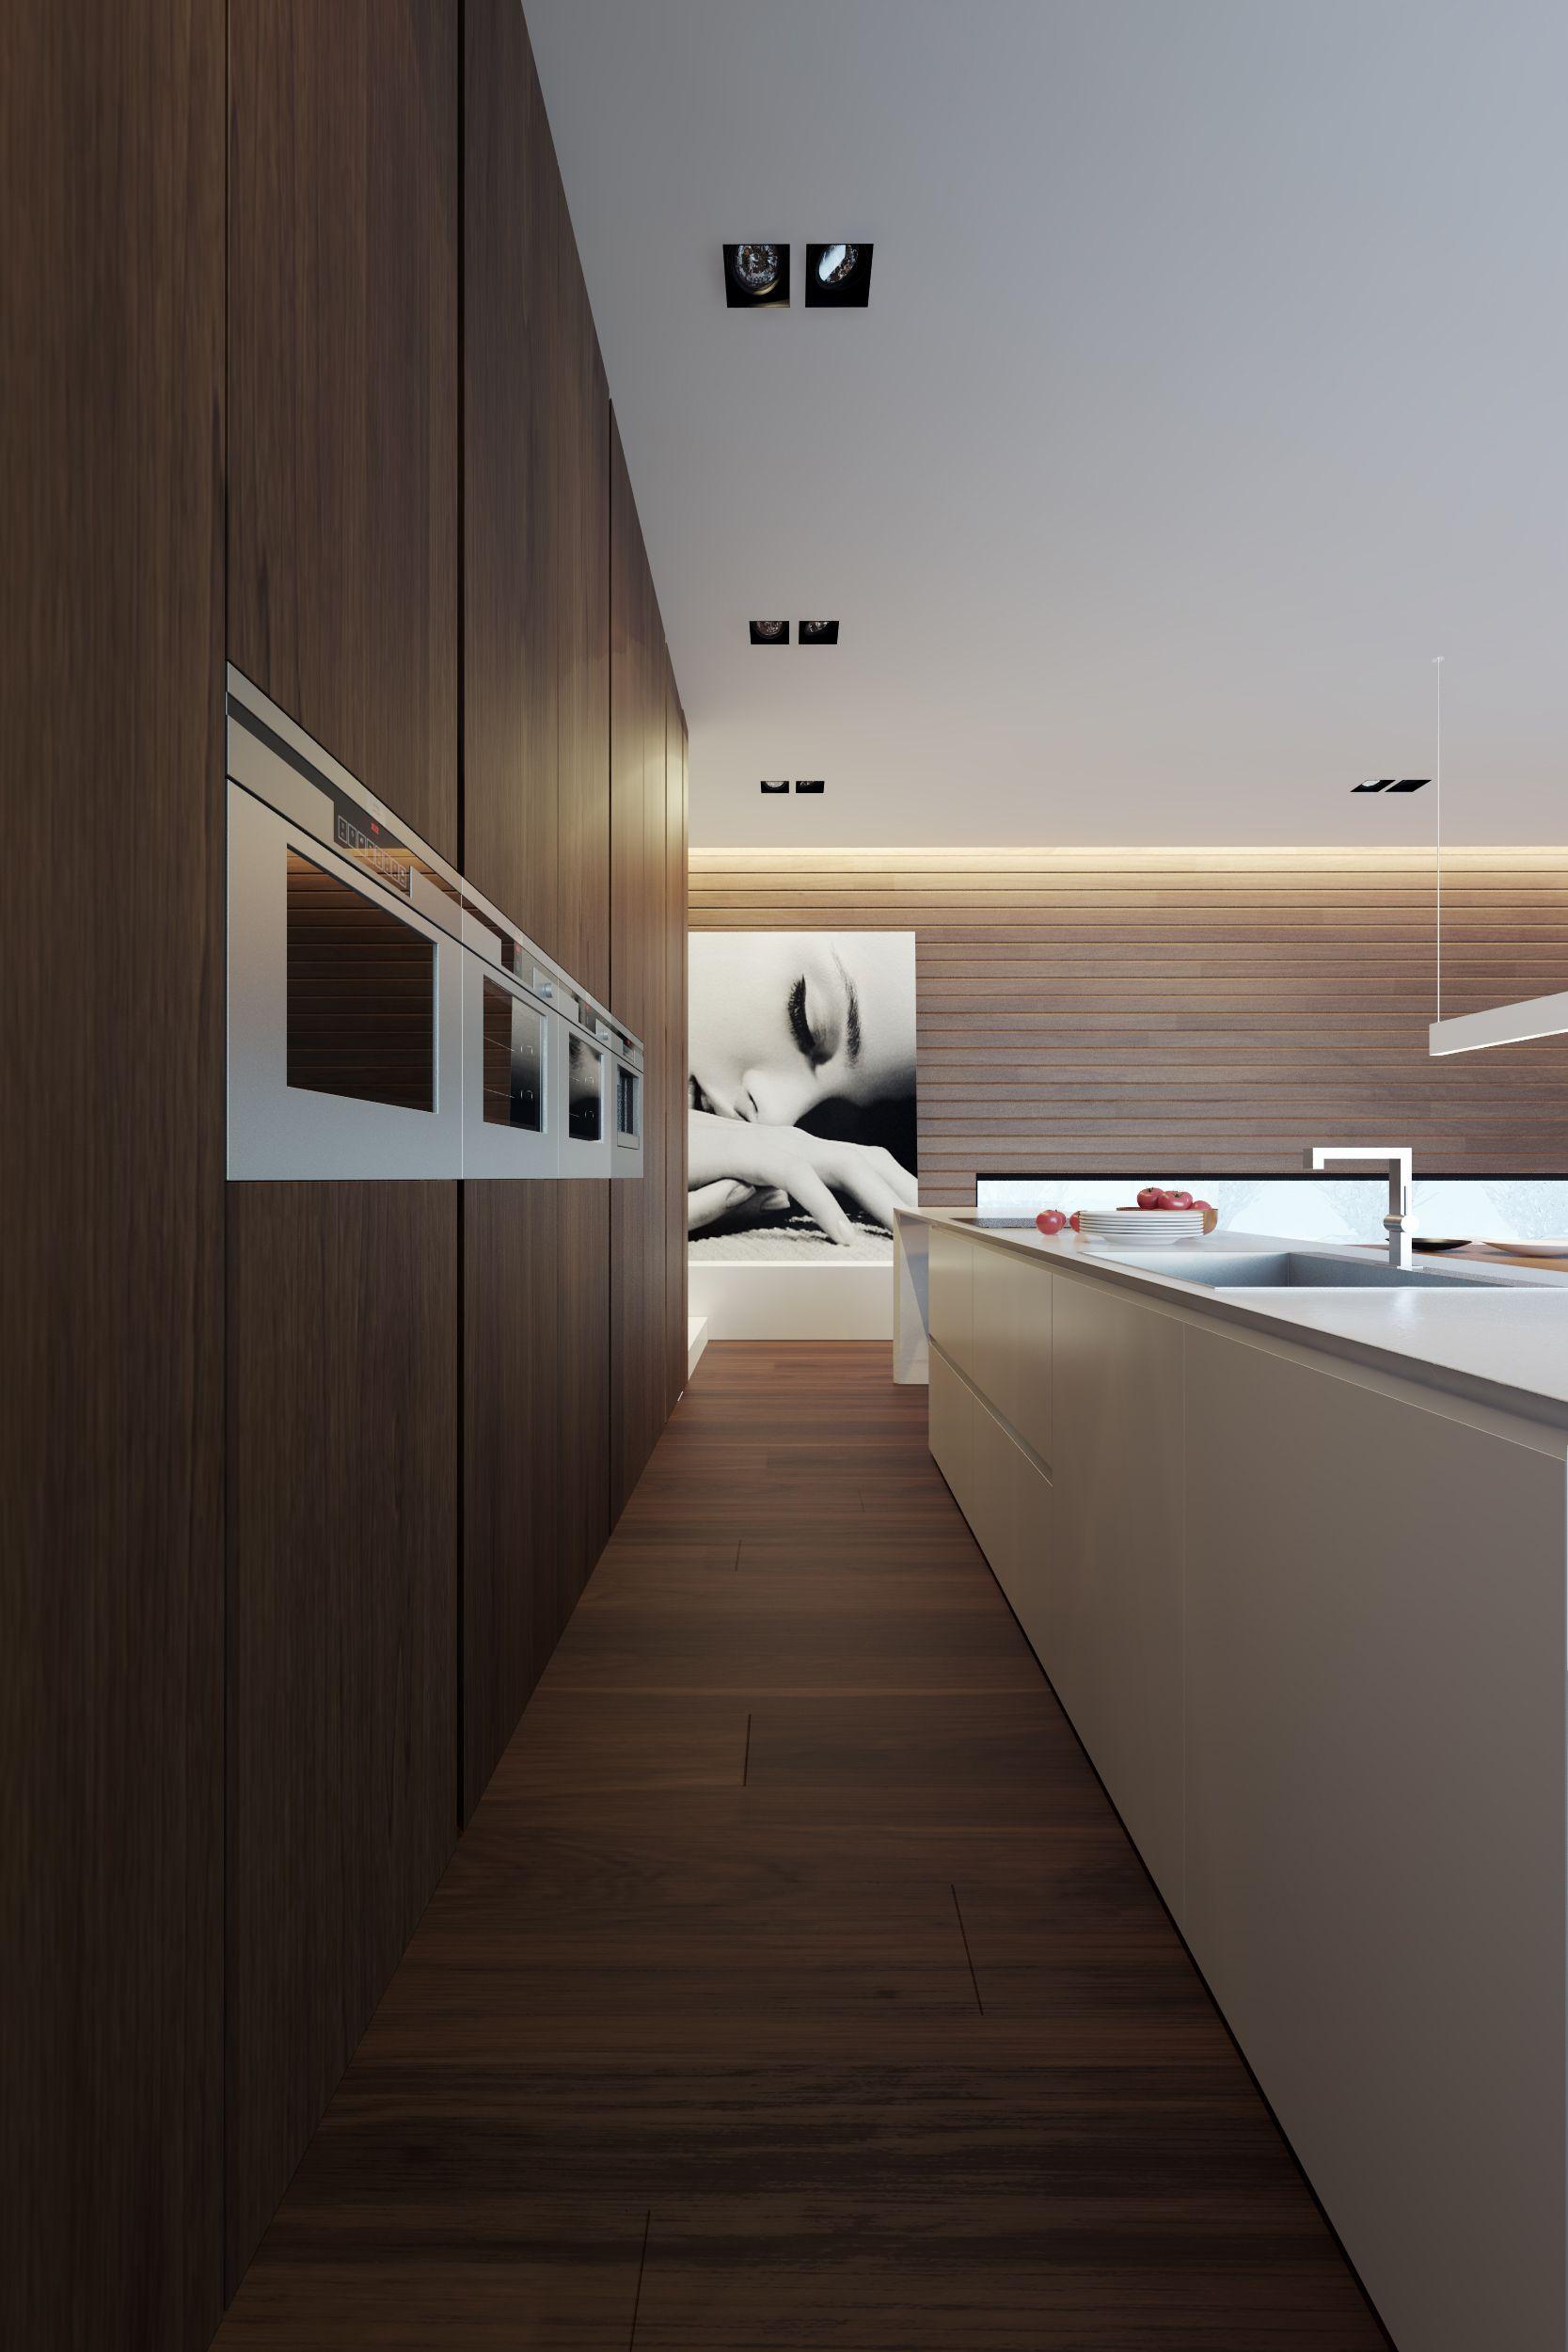 Minimalist Kitchen // modern kitchen with wood wall to provide built ...